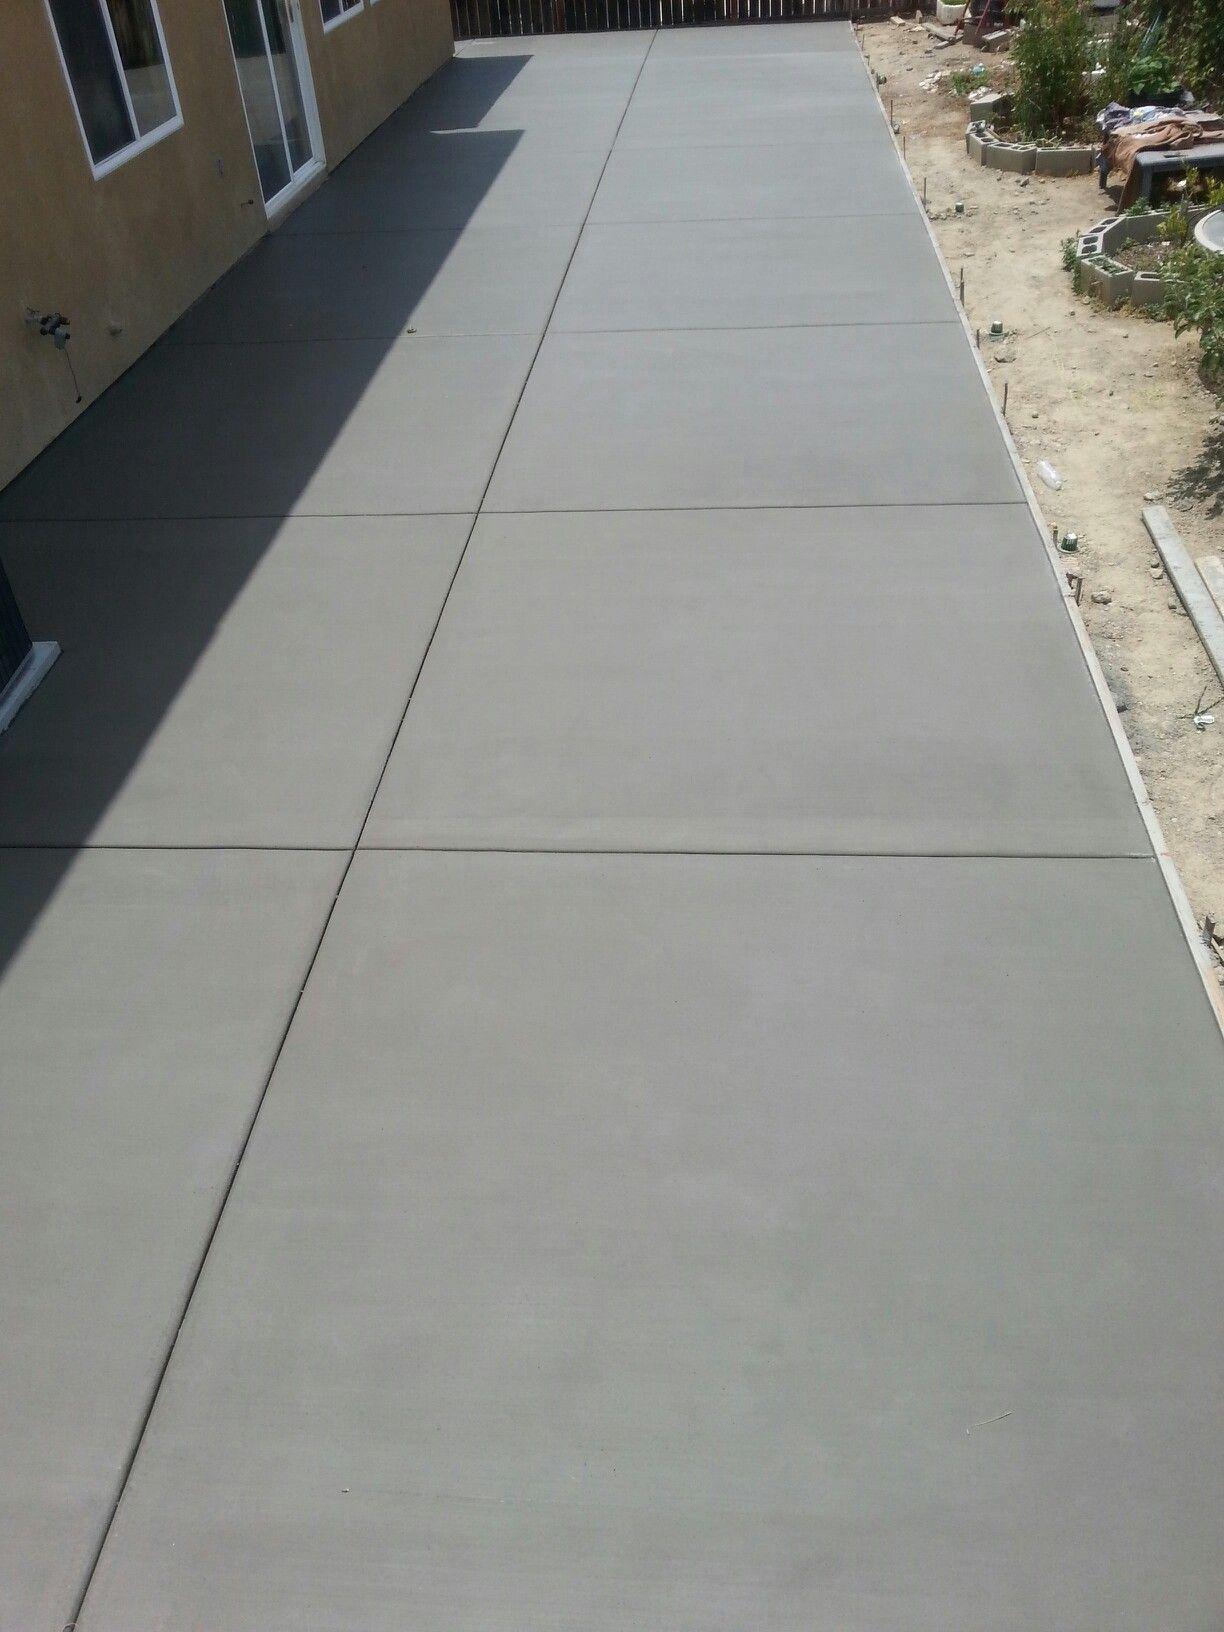 56x16 Broom Finish Patio Slab Concrete Patio Designs pertaining to sizing 1224 X 1632